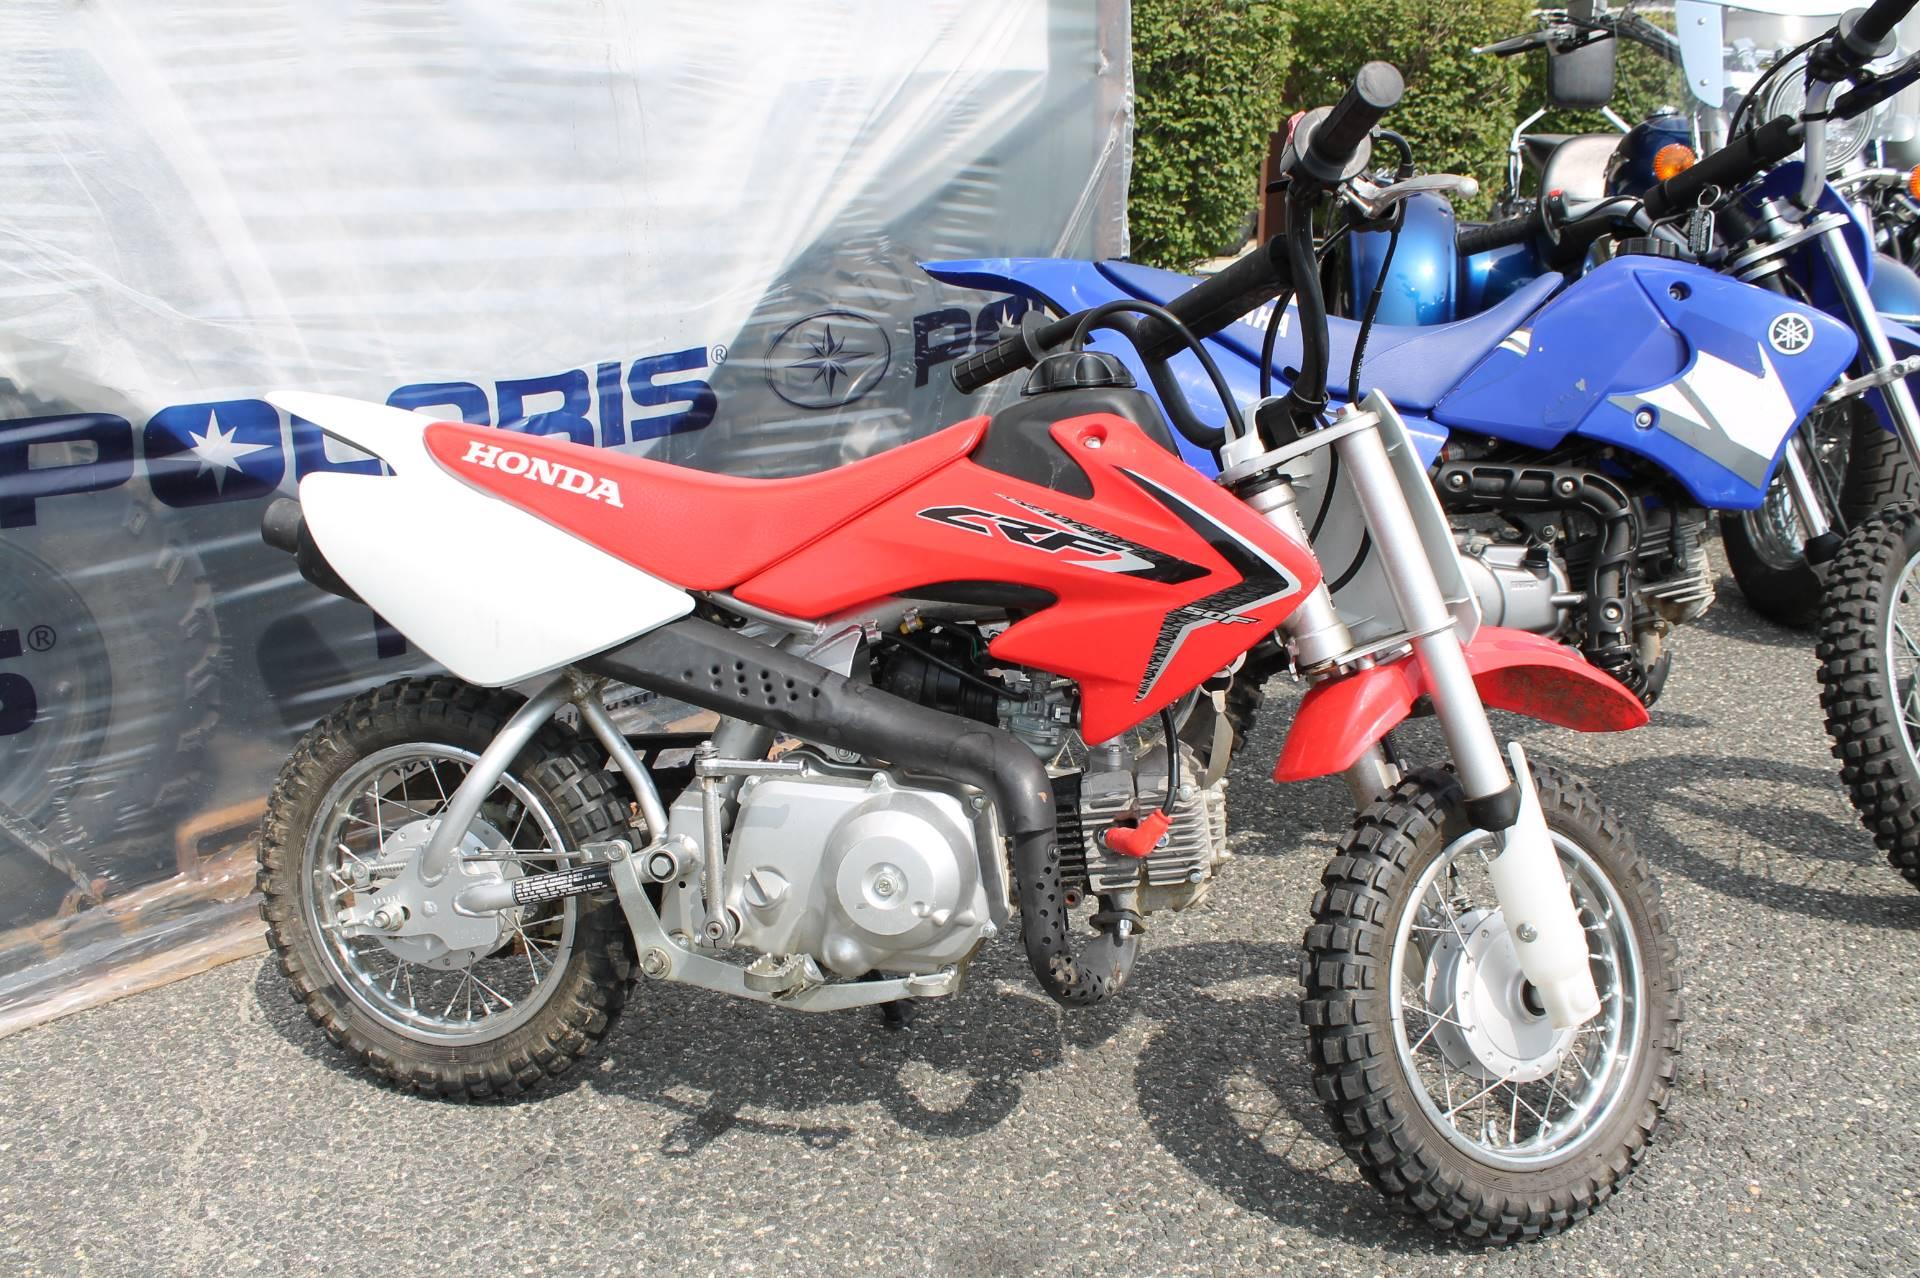 Used 2016 Honda CRF50F Motorcycles in Adams, MA | Stock